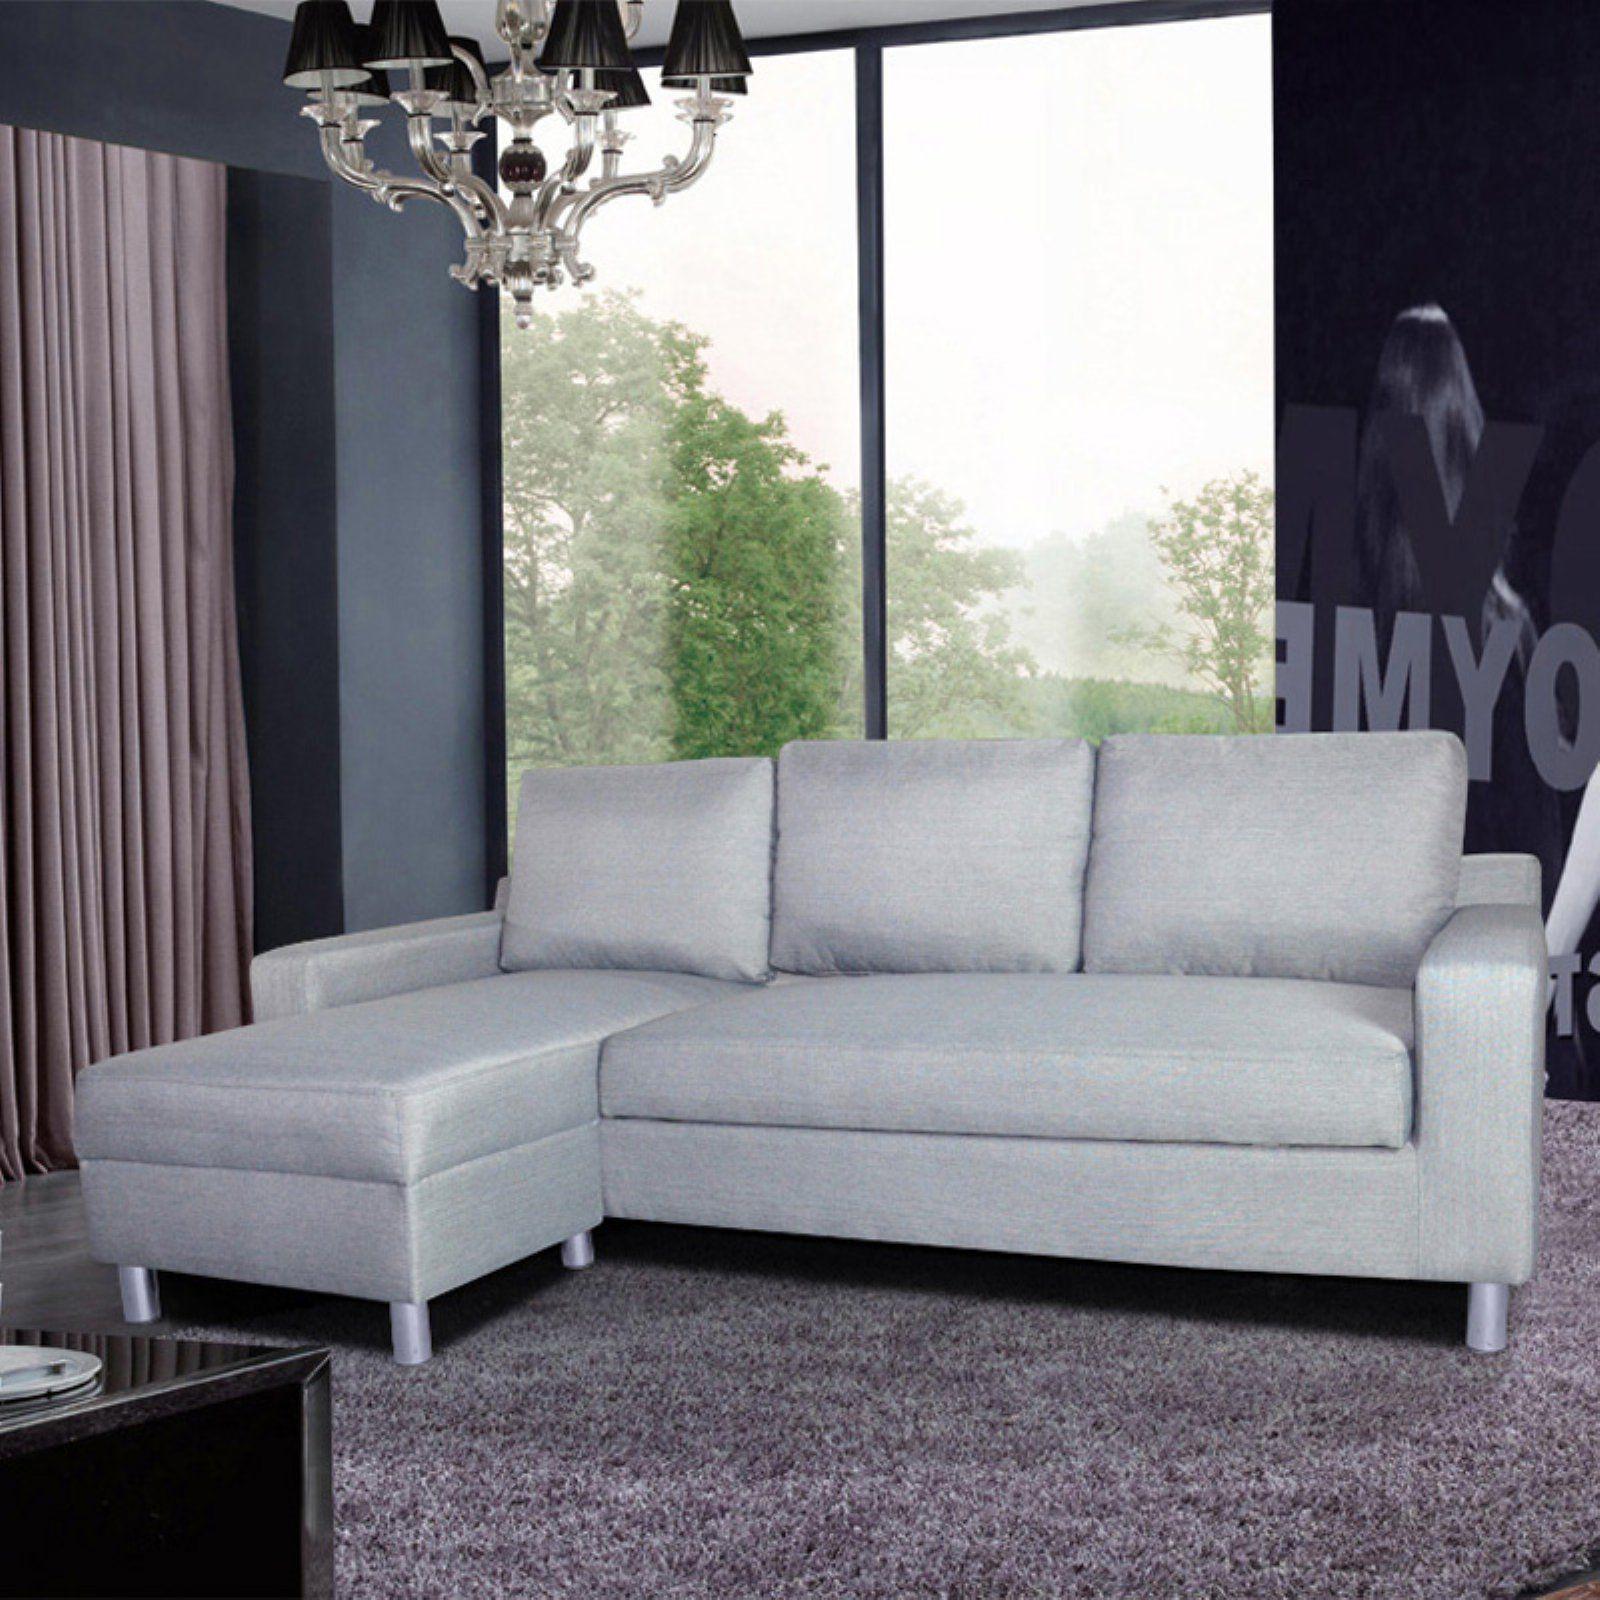 Us Pride Furniture Kachy Convertible Sectional Sofa Gray